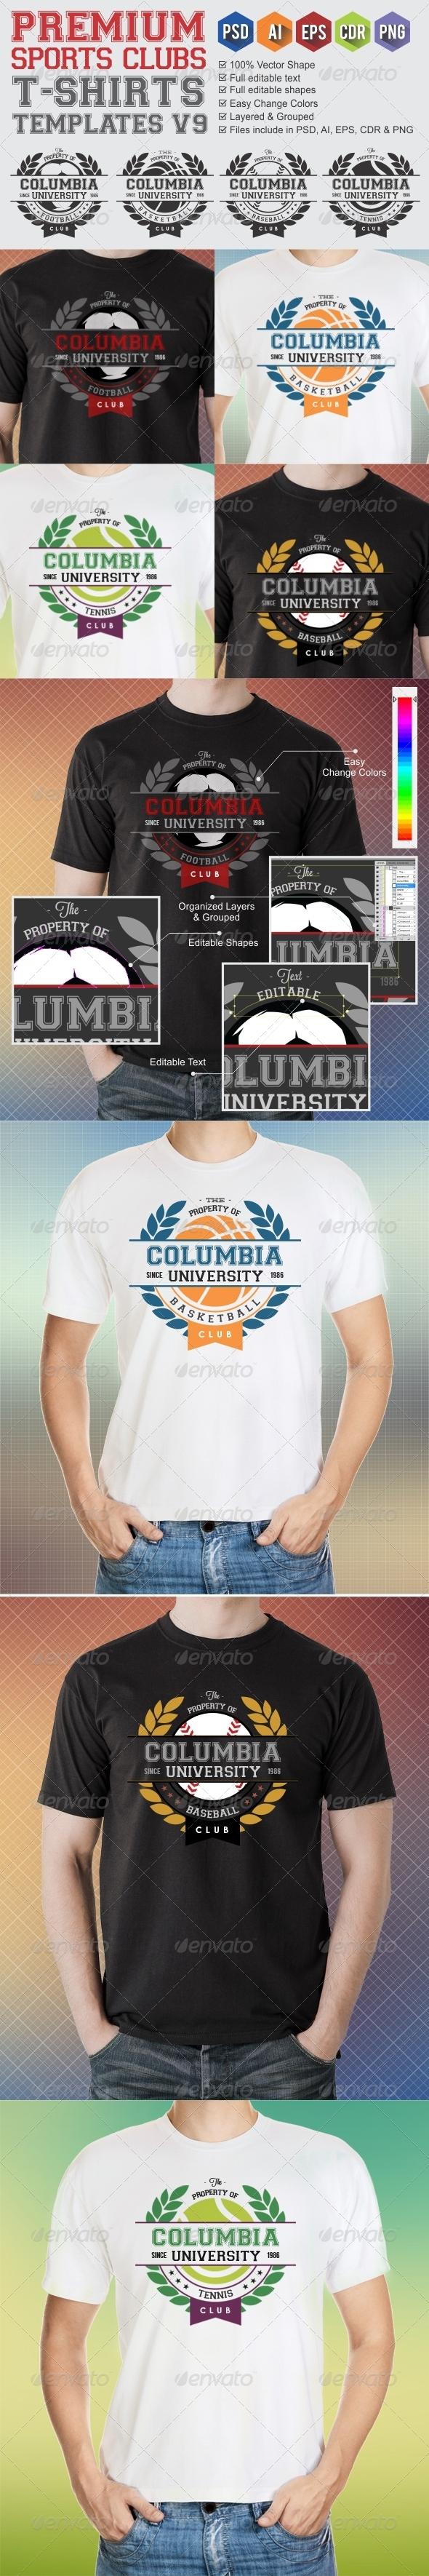 GraphicRiver Premium Sports Clubs T-Shirt Templates v9 6758533